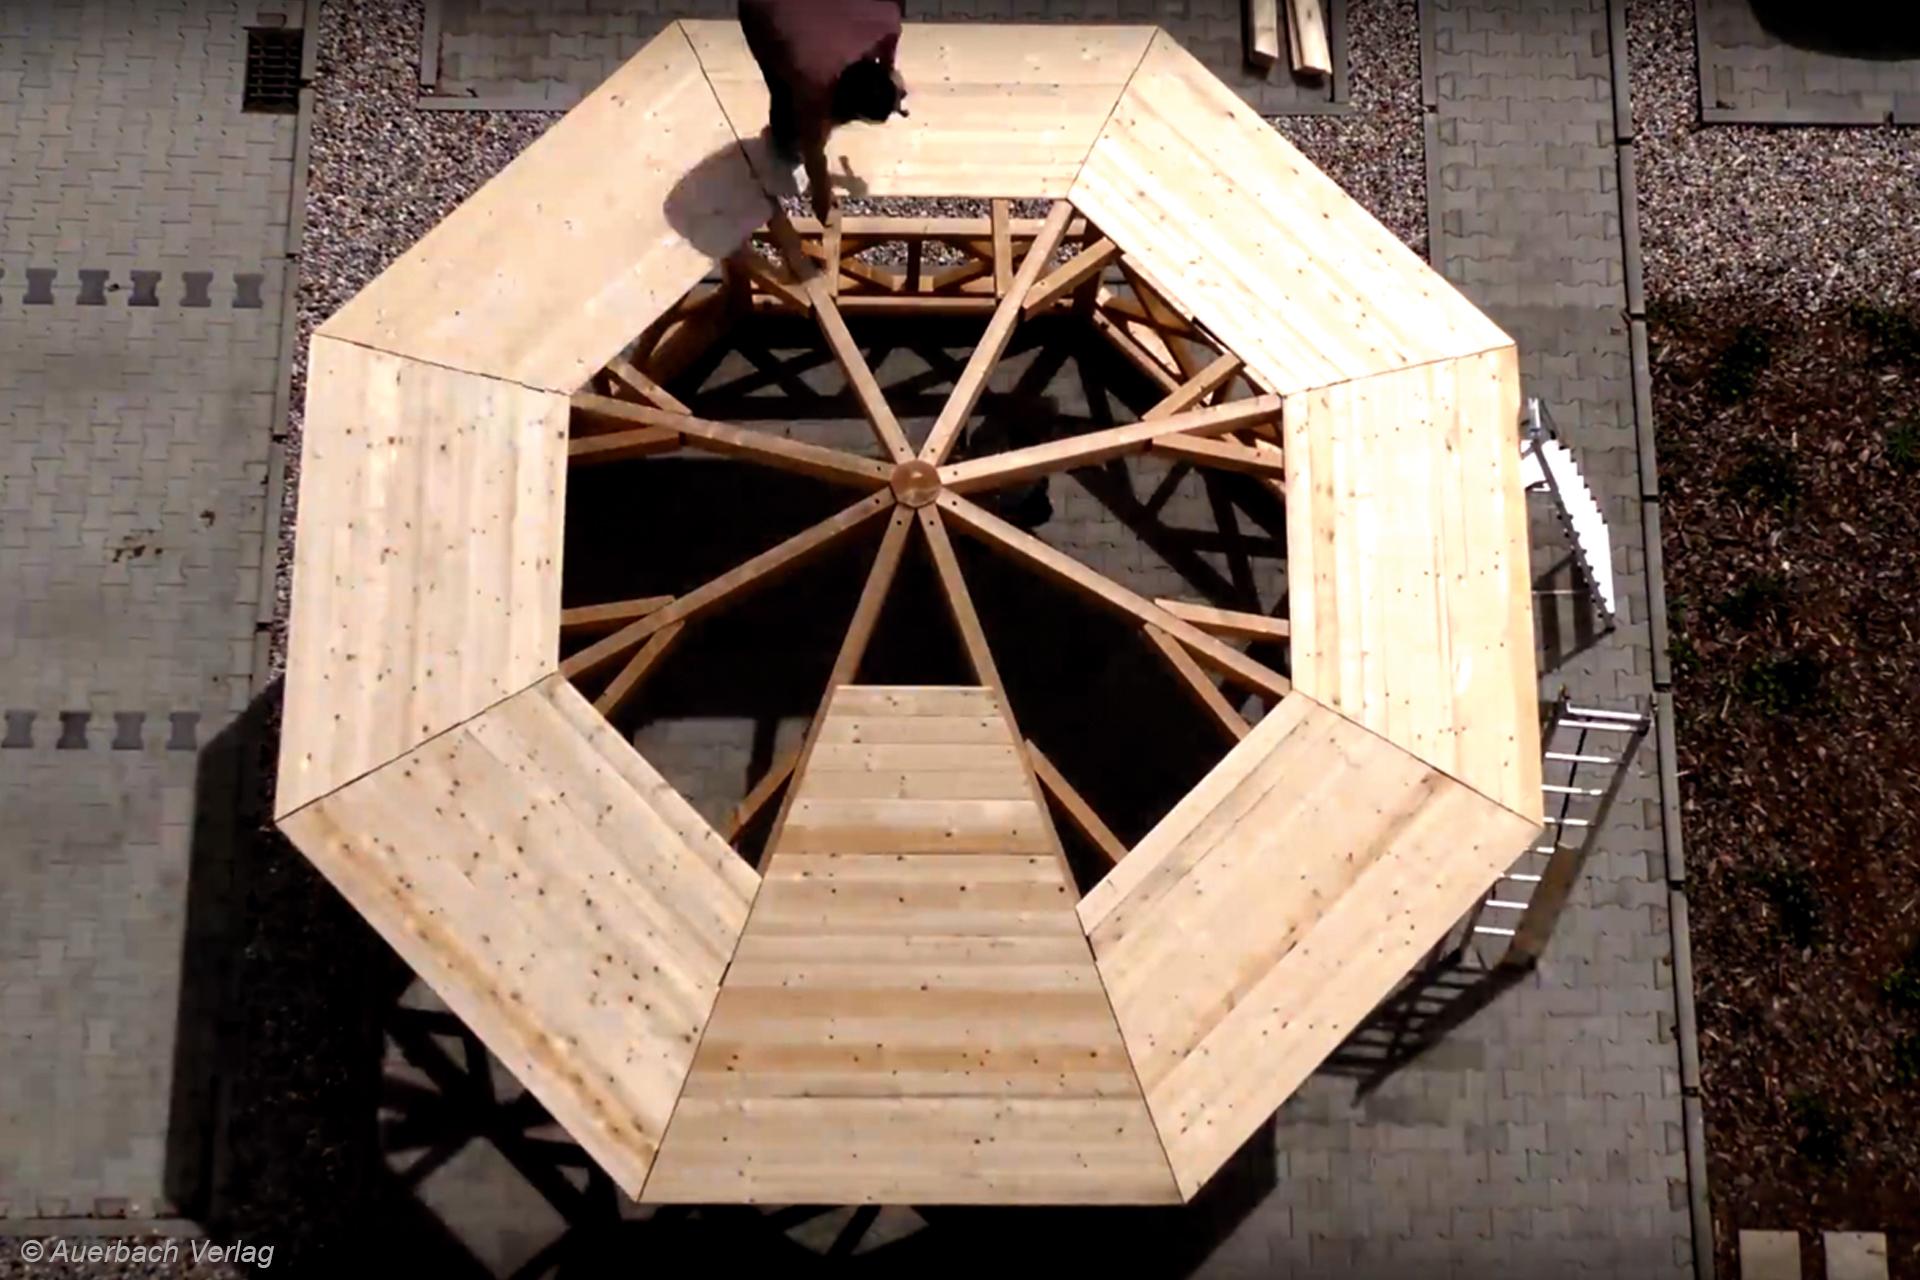 palmako gartenpavillon betty im test haus garten test. Black Bedroom Furniture Sets. Home Design Ideas